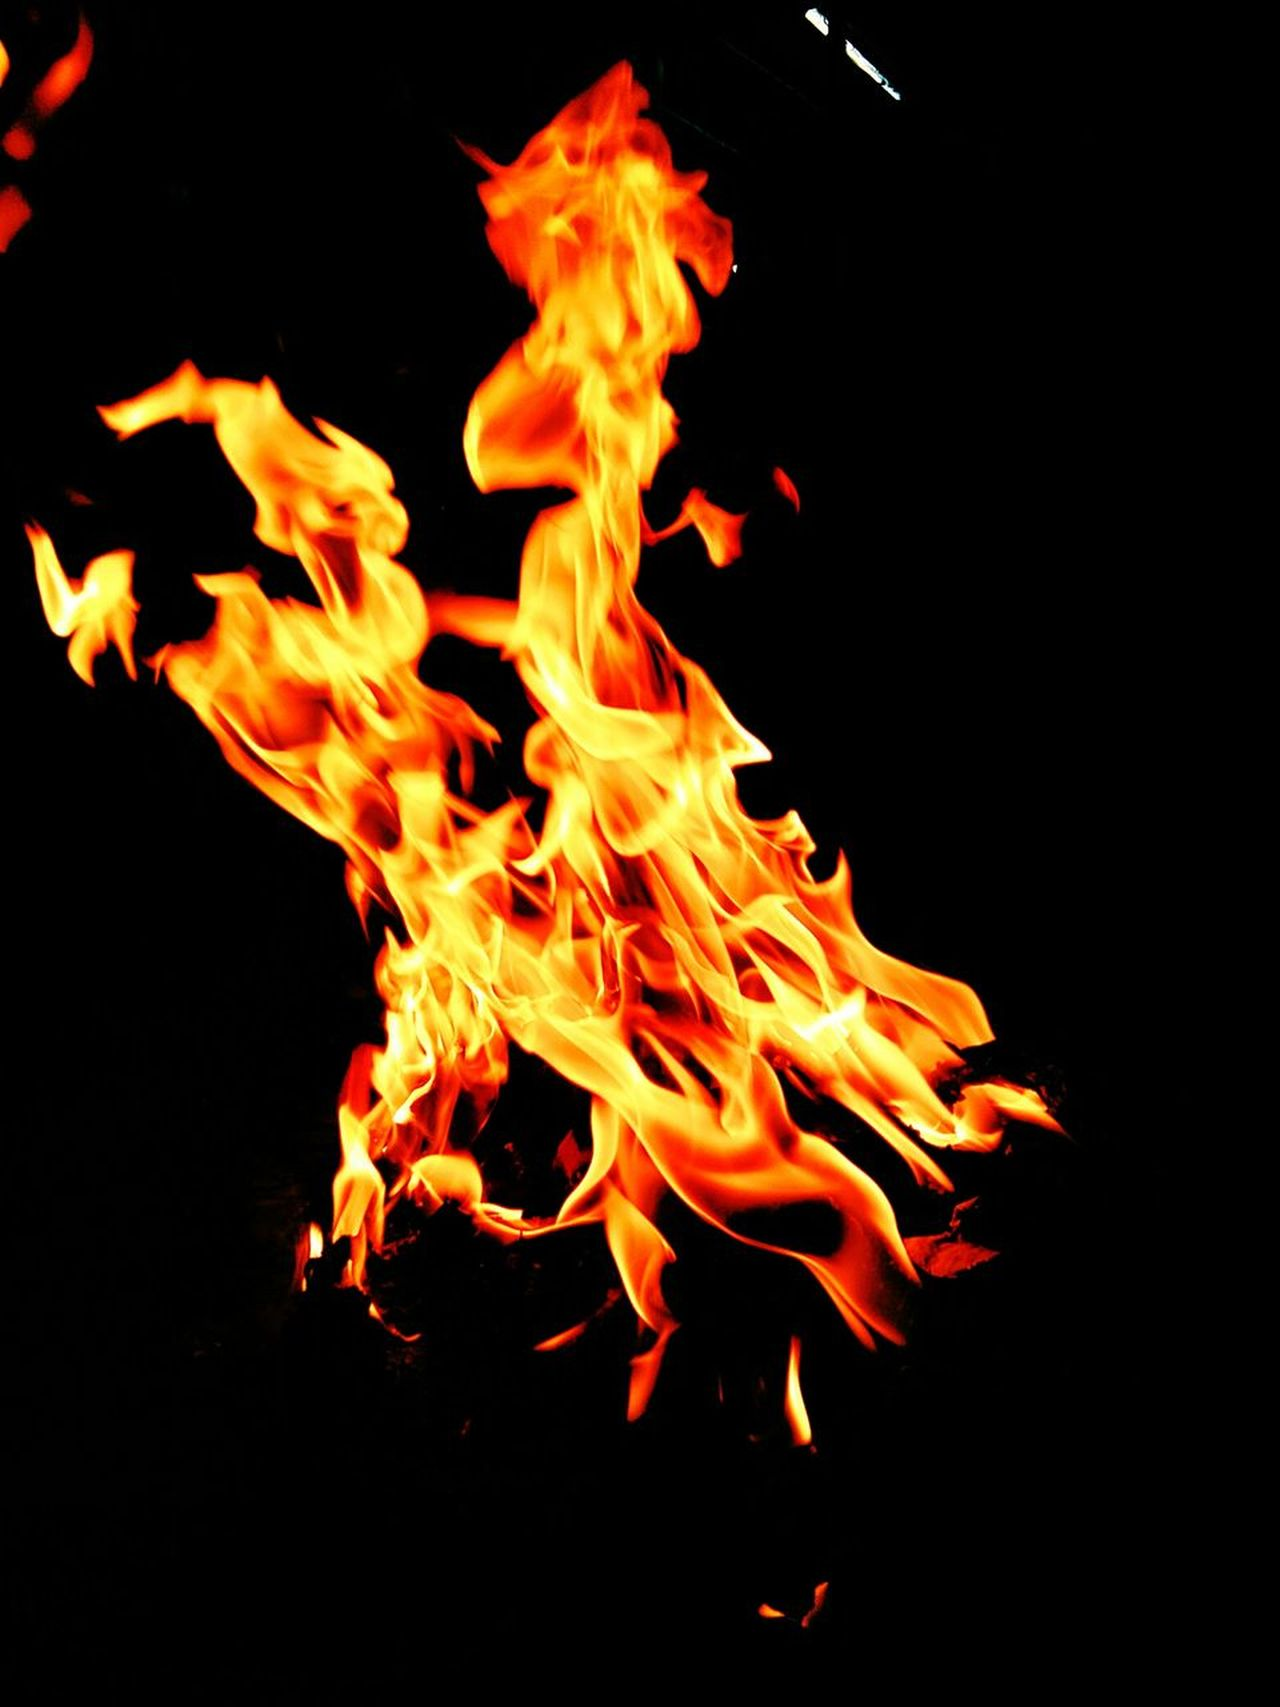 Fire - Natural Phenomenon Heat - Temperature Black Background Bonfire Close-up Night No People Burning Black Color Inferno Flame